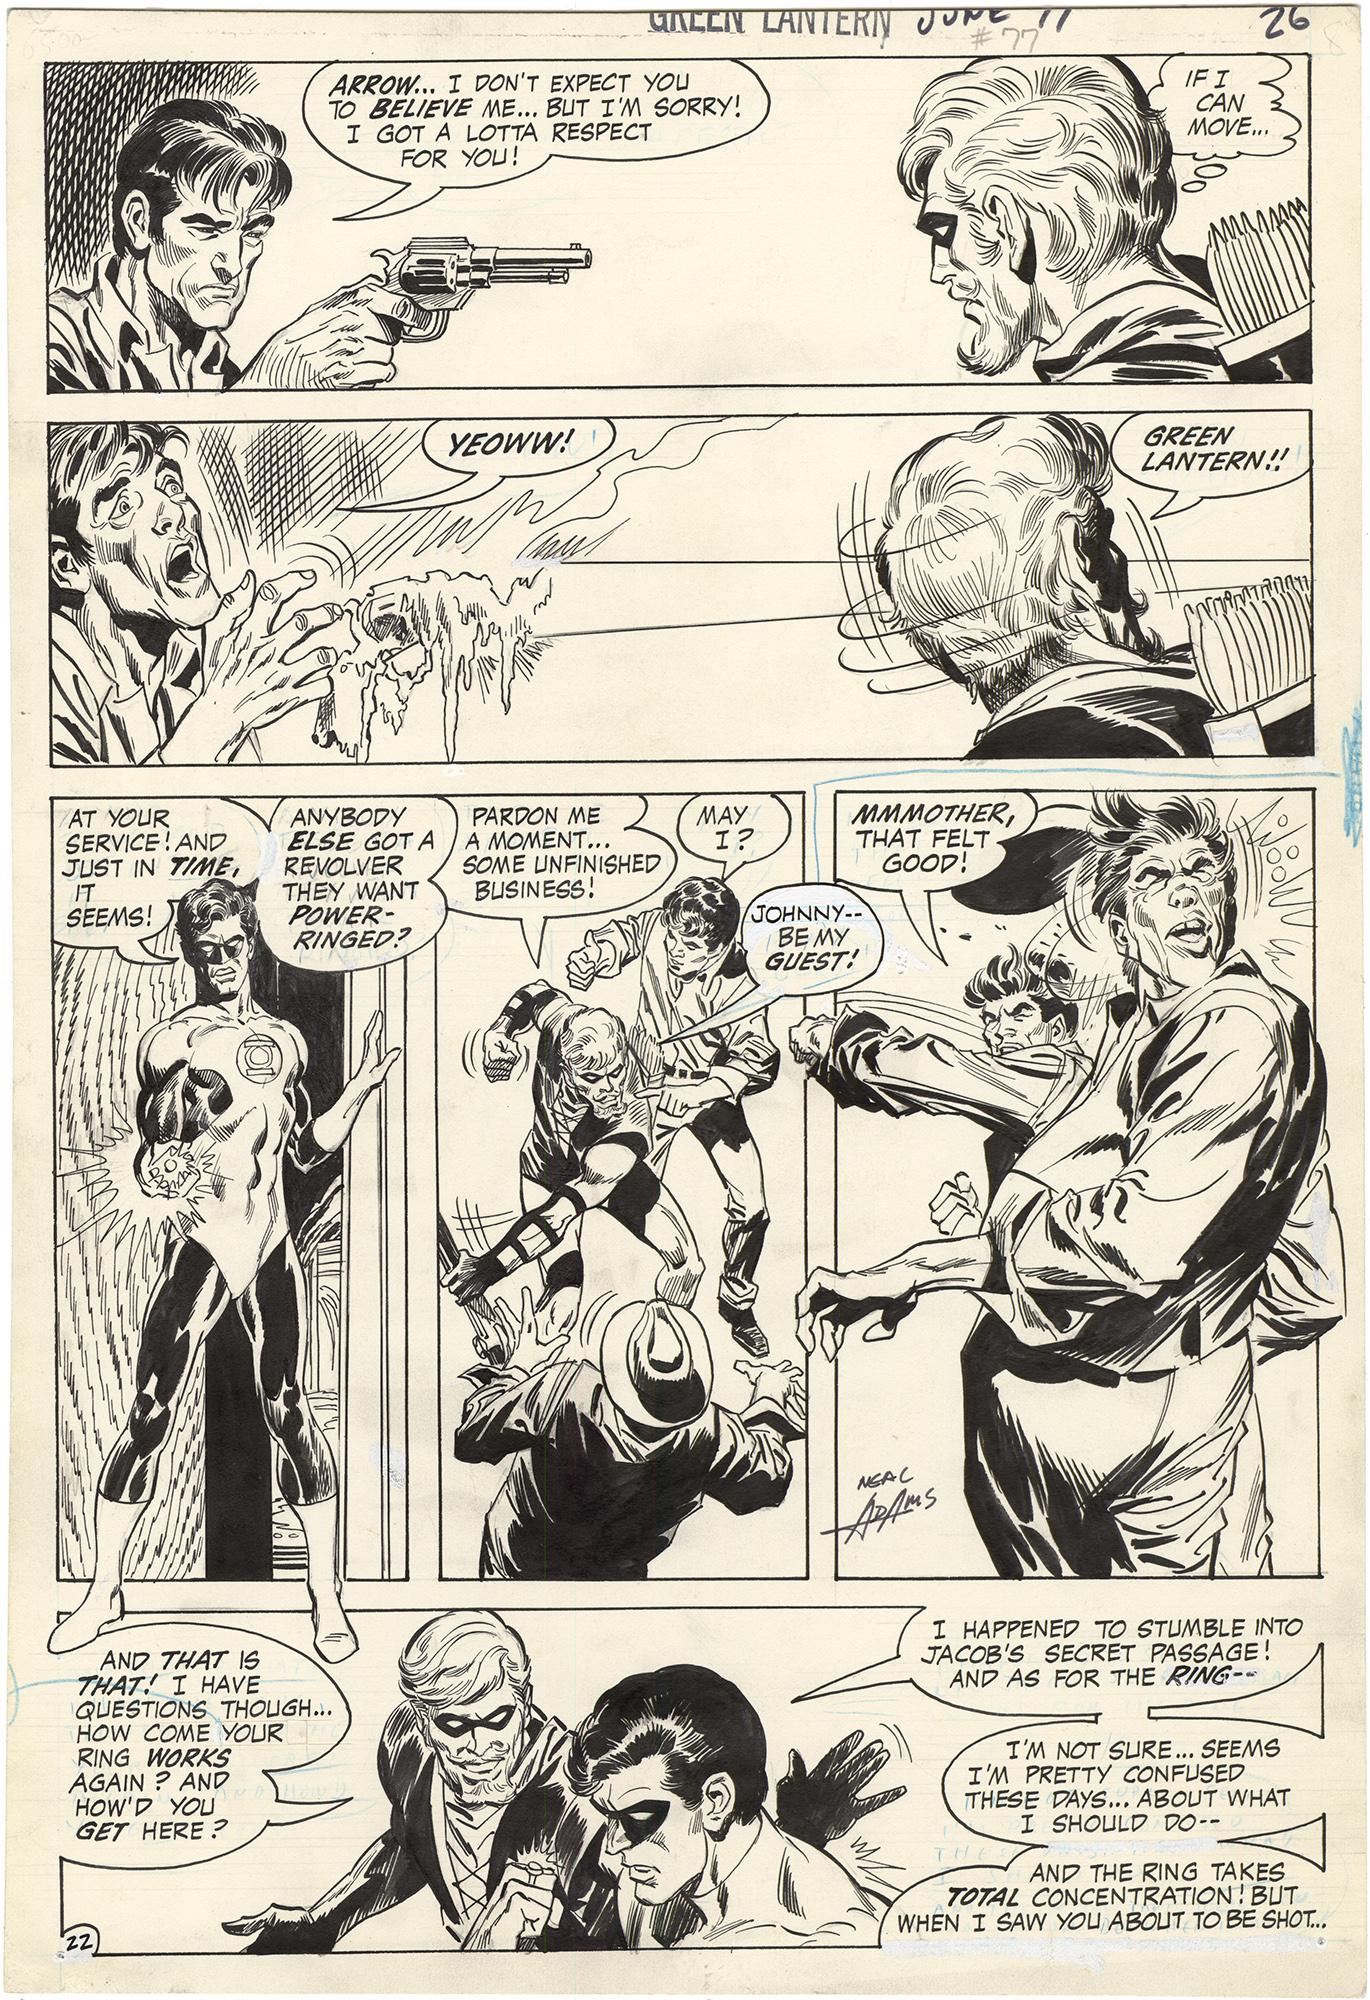 Green Lantern #77 p22